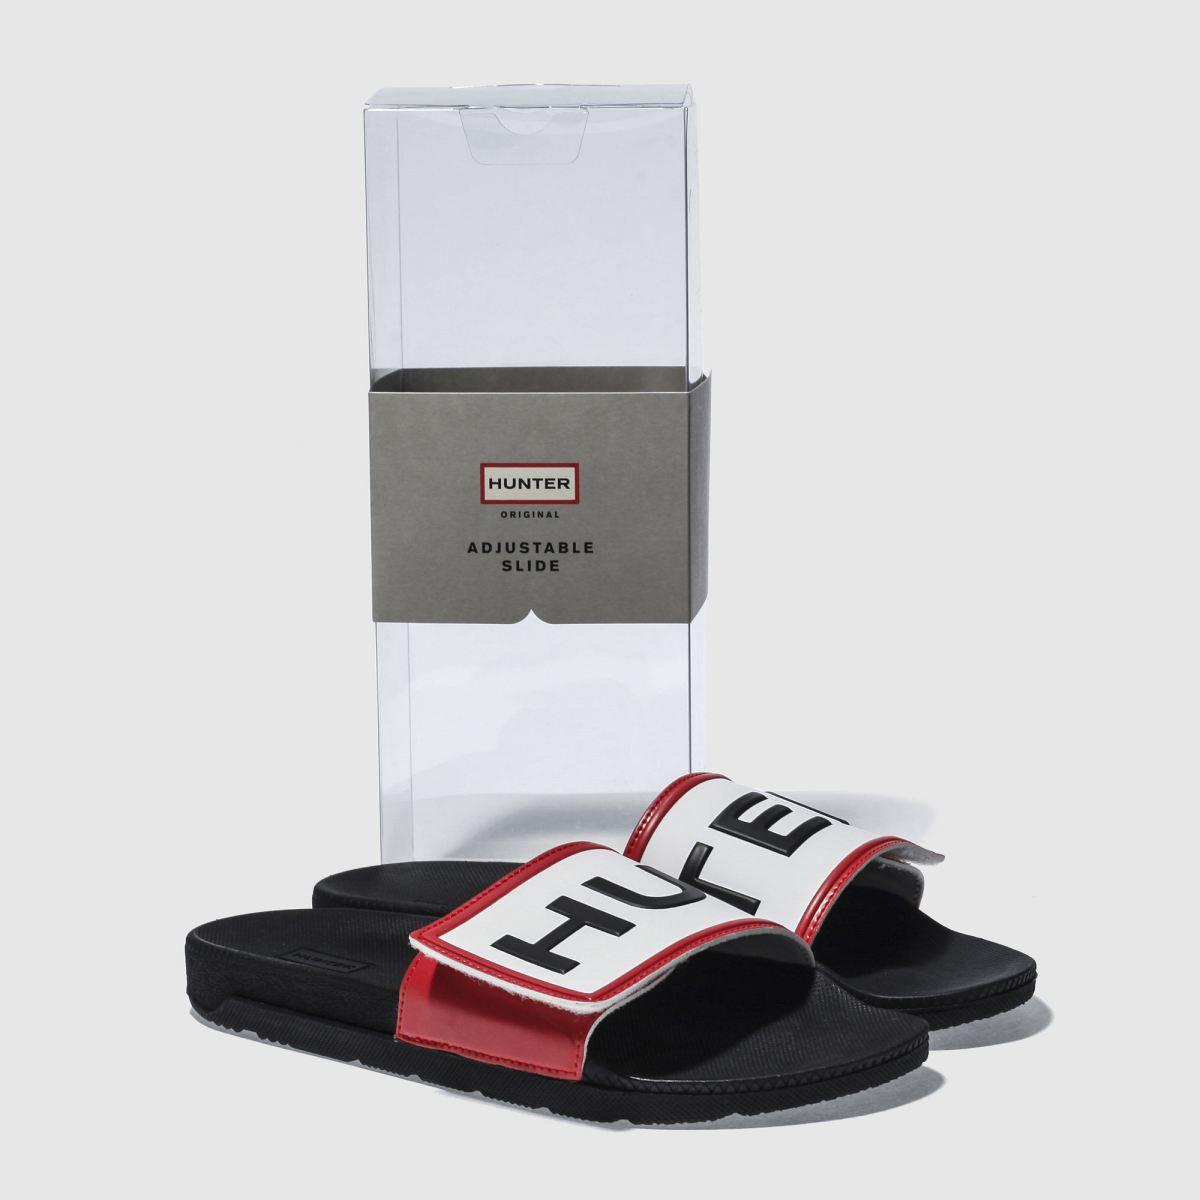 Damen Schwarz hunter Adjustable Logo Slide Sandalen beliebte | schuh Gute Qualität beliebte Sandalen Schuhe f49dea